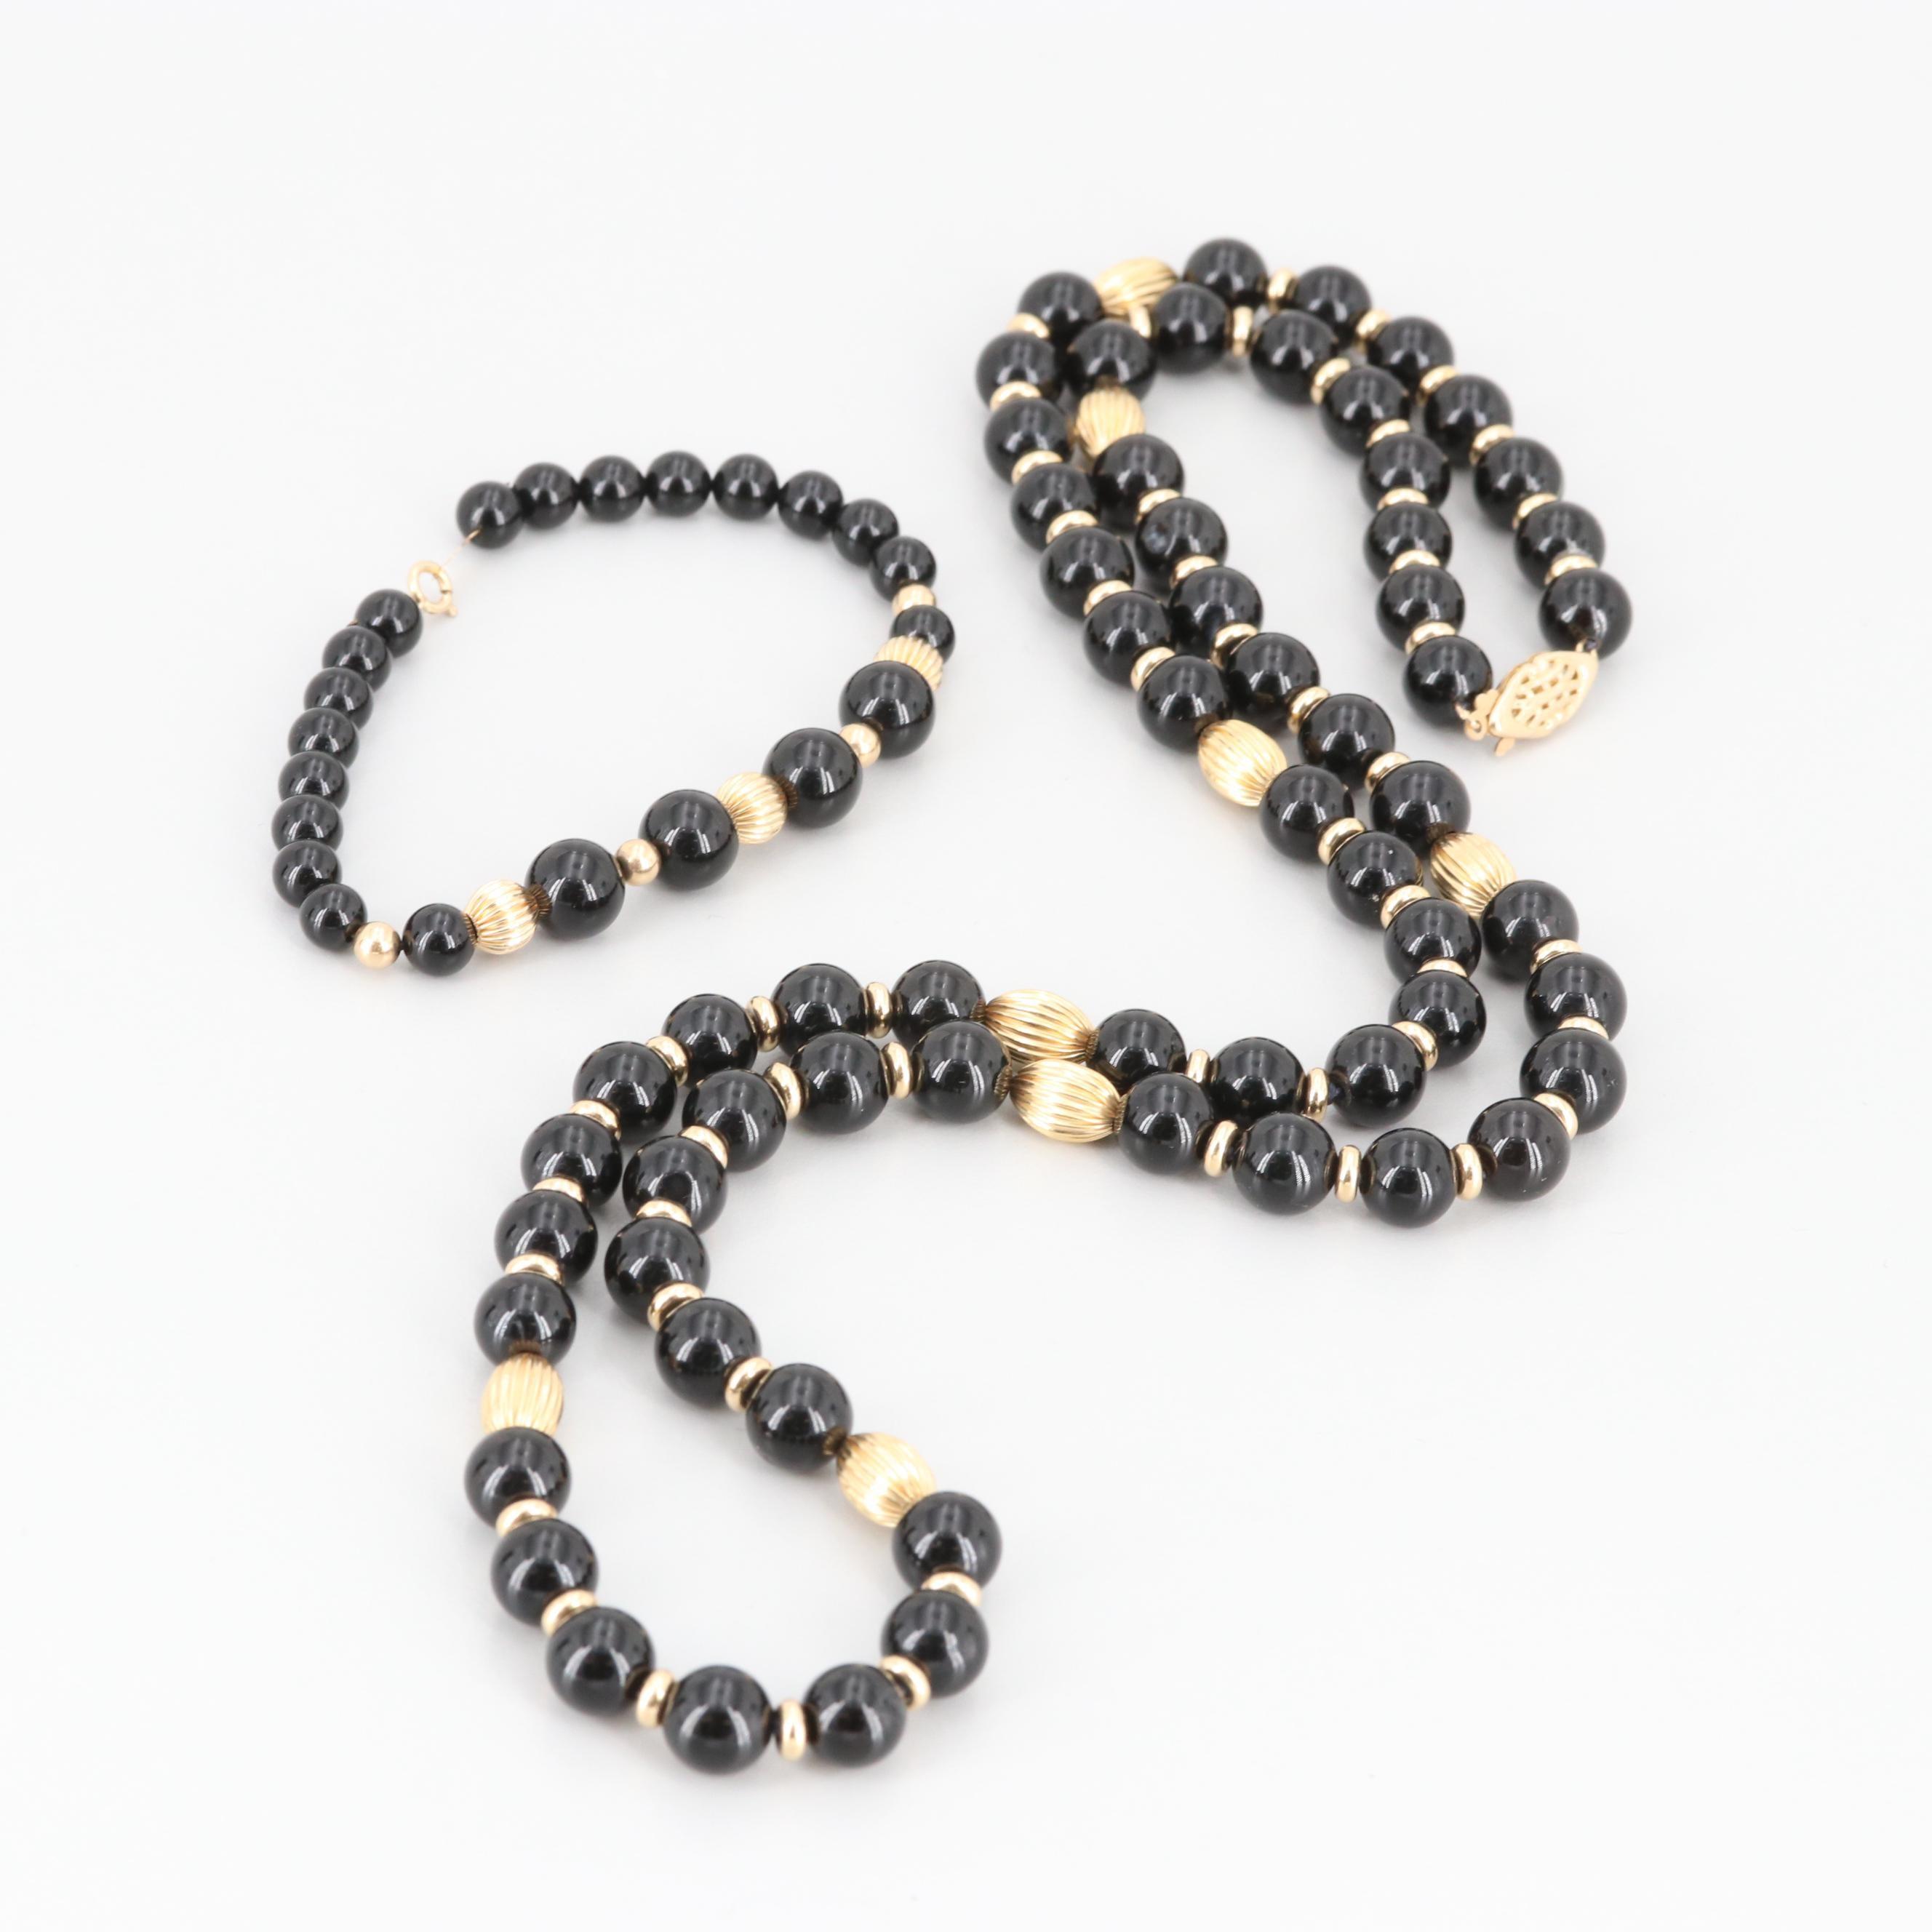 14K Yellow Gold Black Onyx Bead Necklace and Bracelet